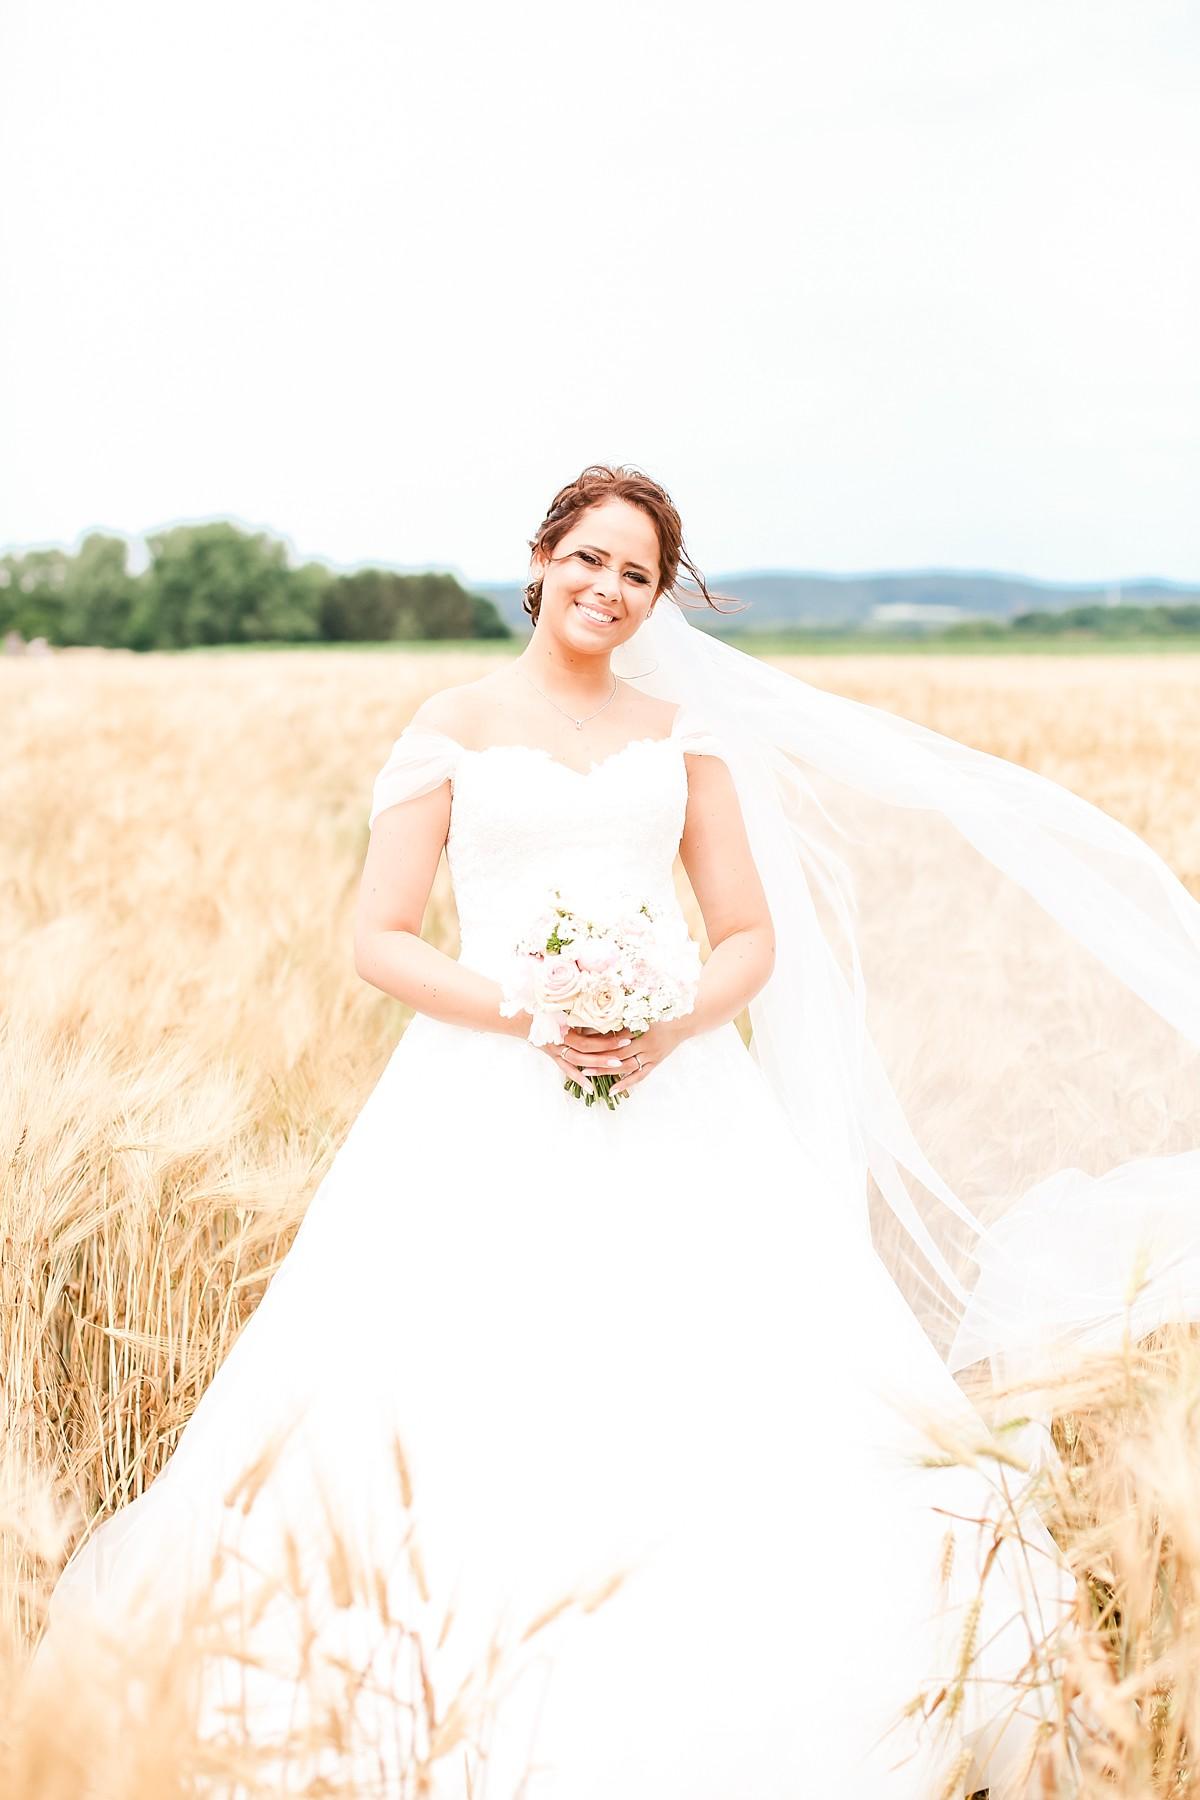 Hochzeitsfotograf-Bünde-Hücker-Moor-Fotograf-Moor-Ranch_0170